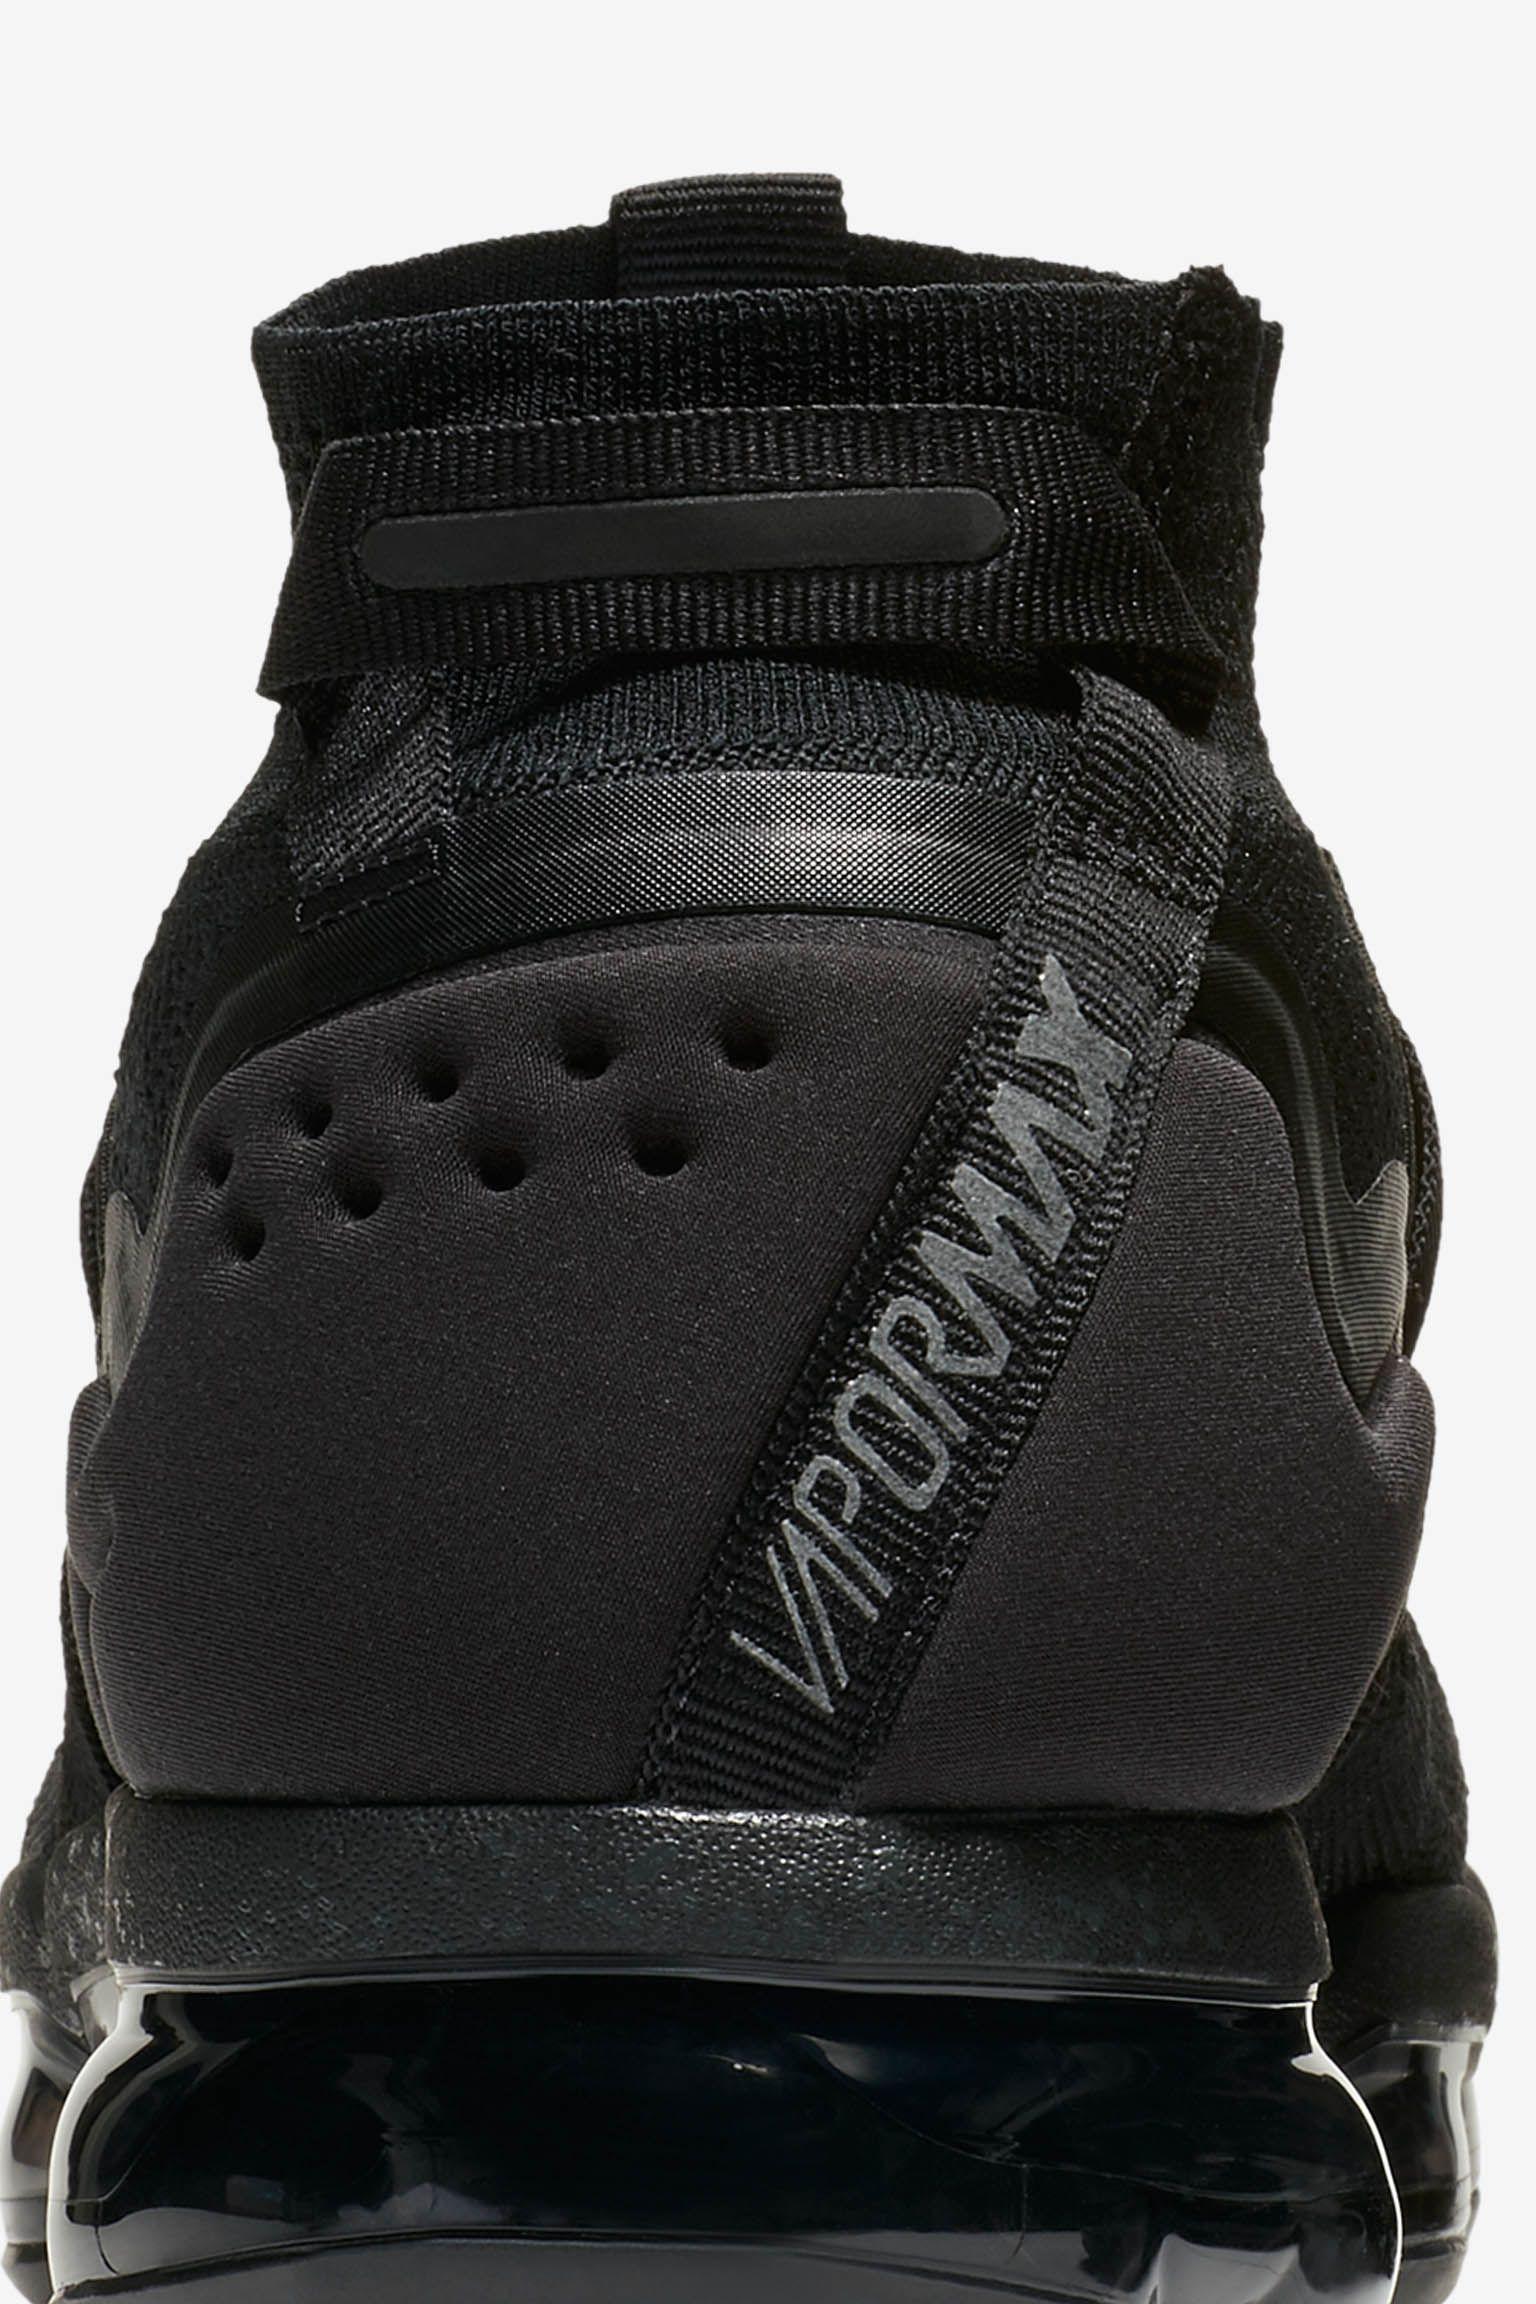 Nike Air Vapormax Flyknit Utility 'Black' Release Date